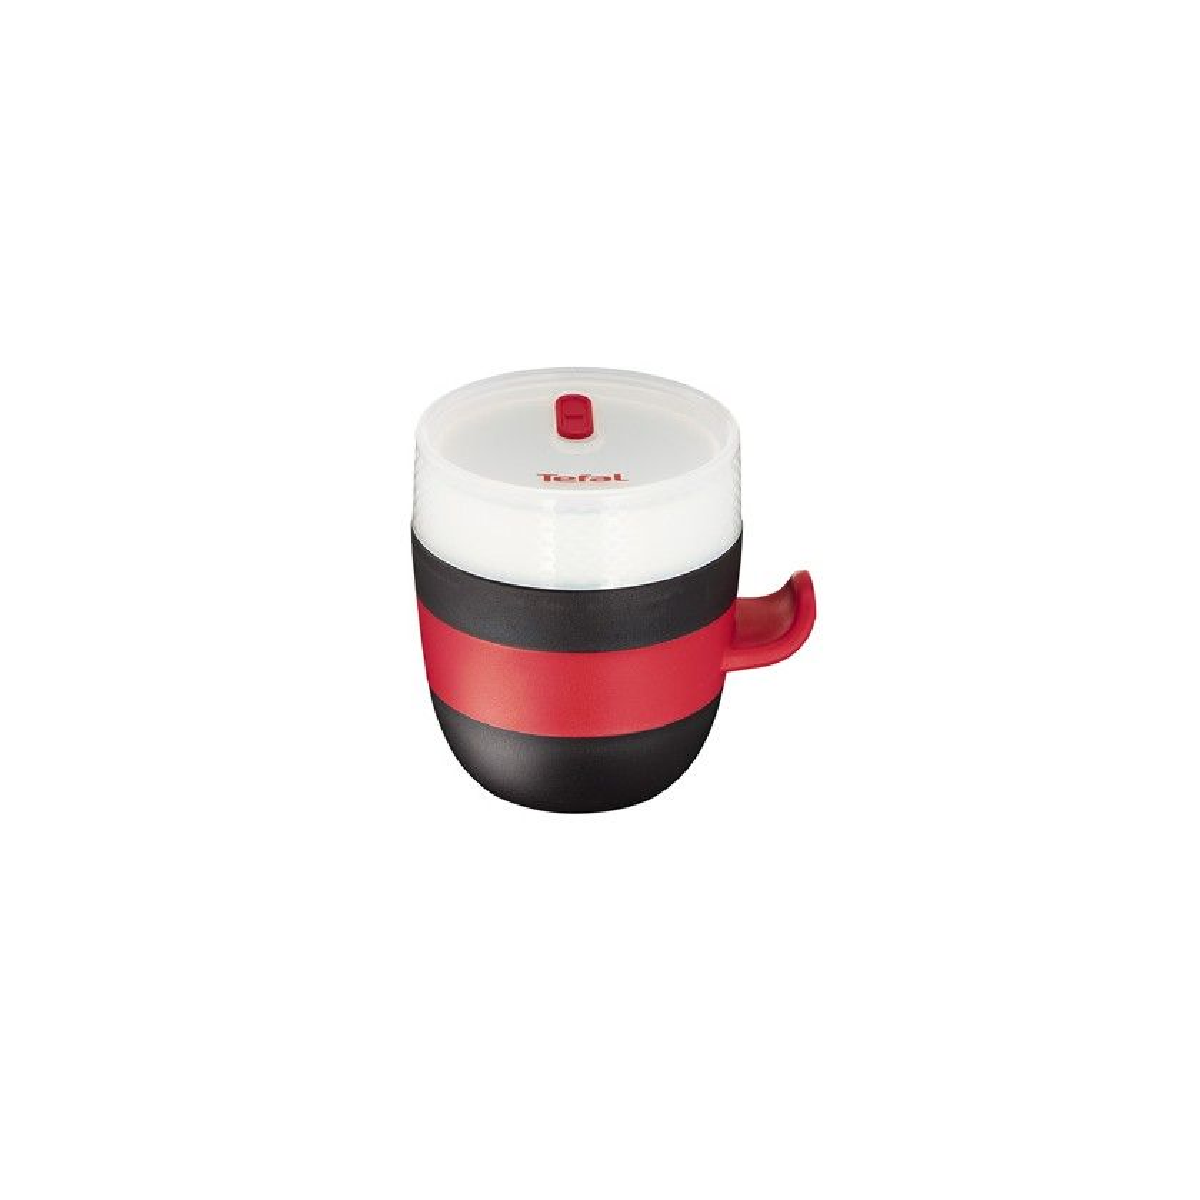 Tefal Ingenio - Quick Mug - 0.5 L